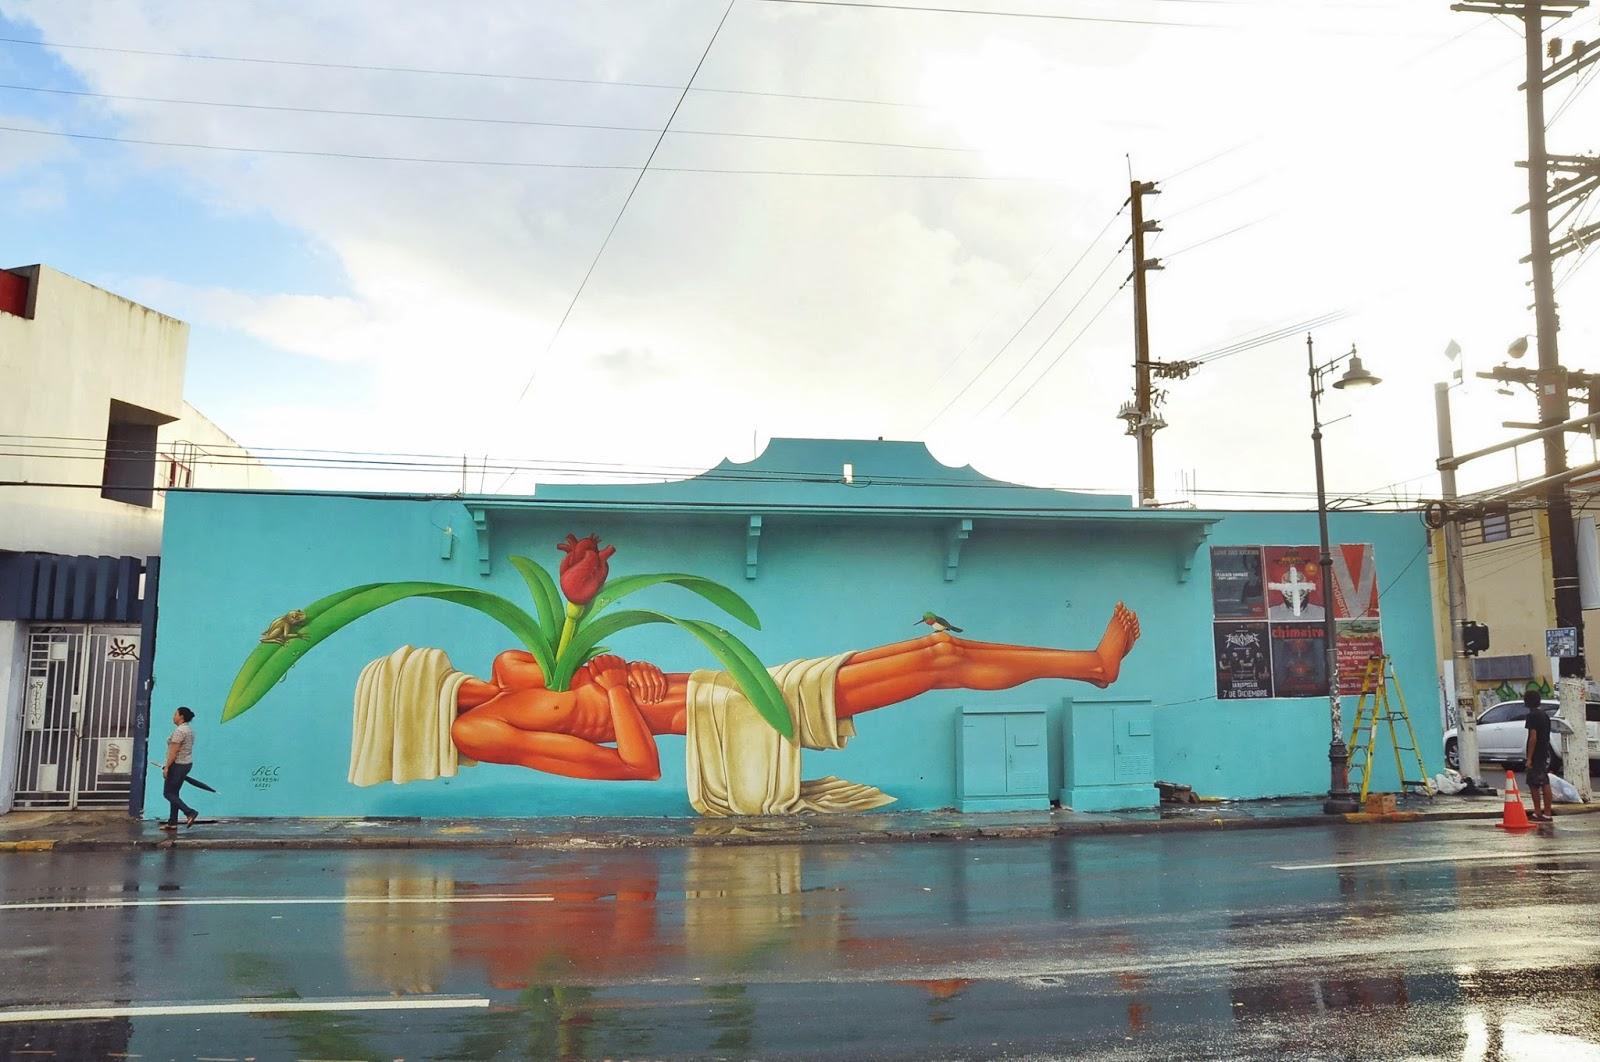 interesni-kazki-new-mural-los-muros-hablan-03